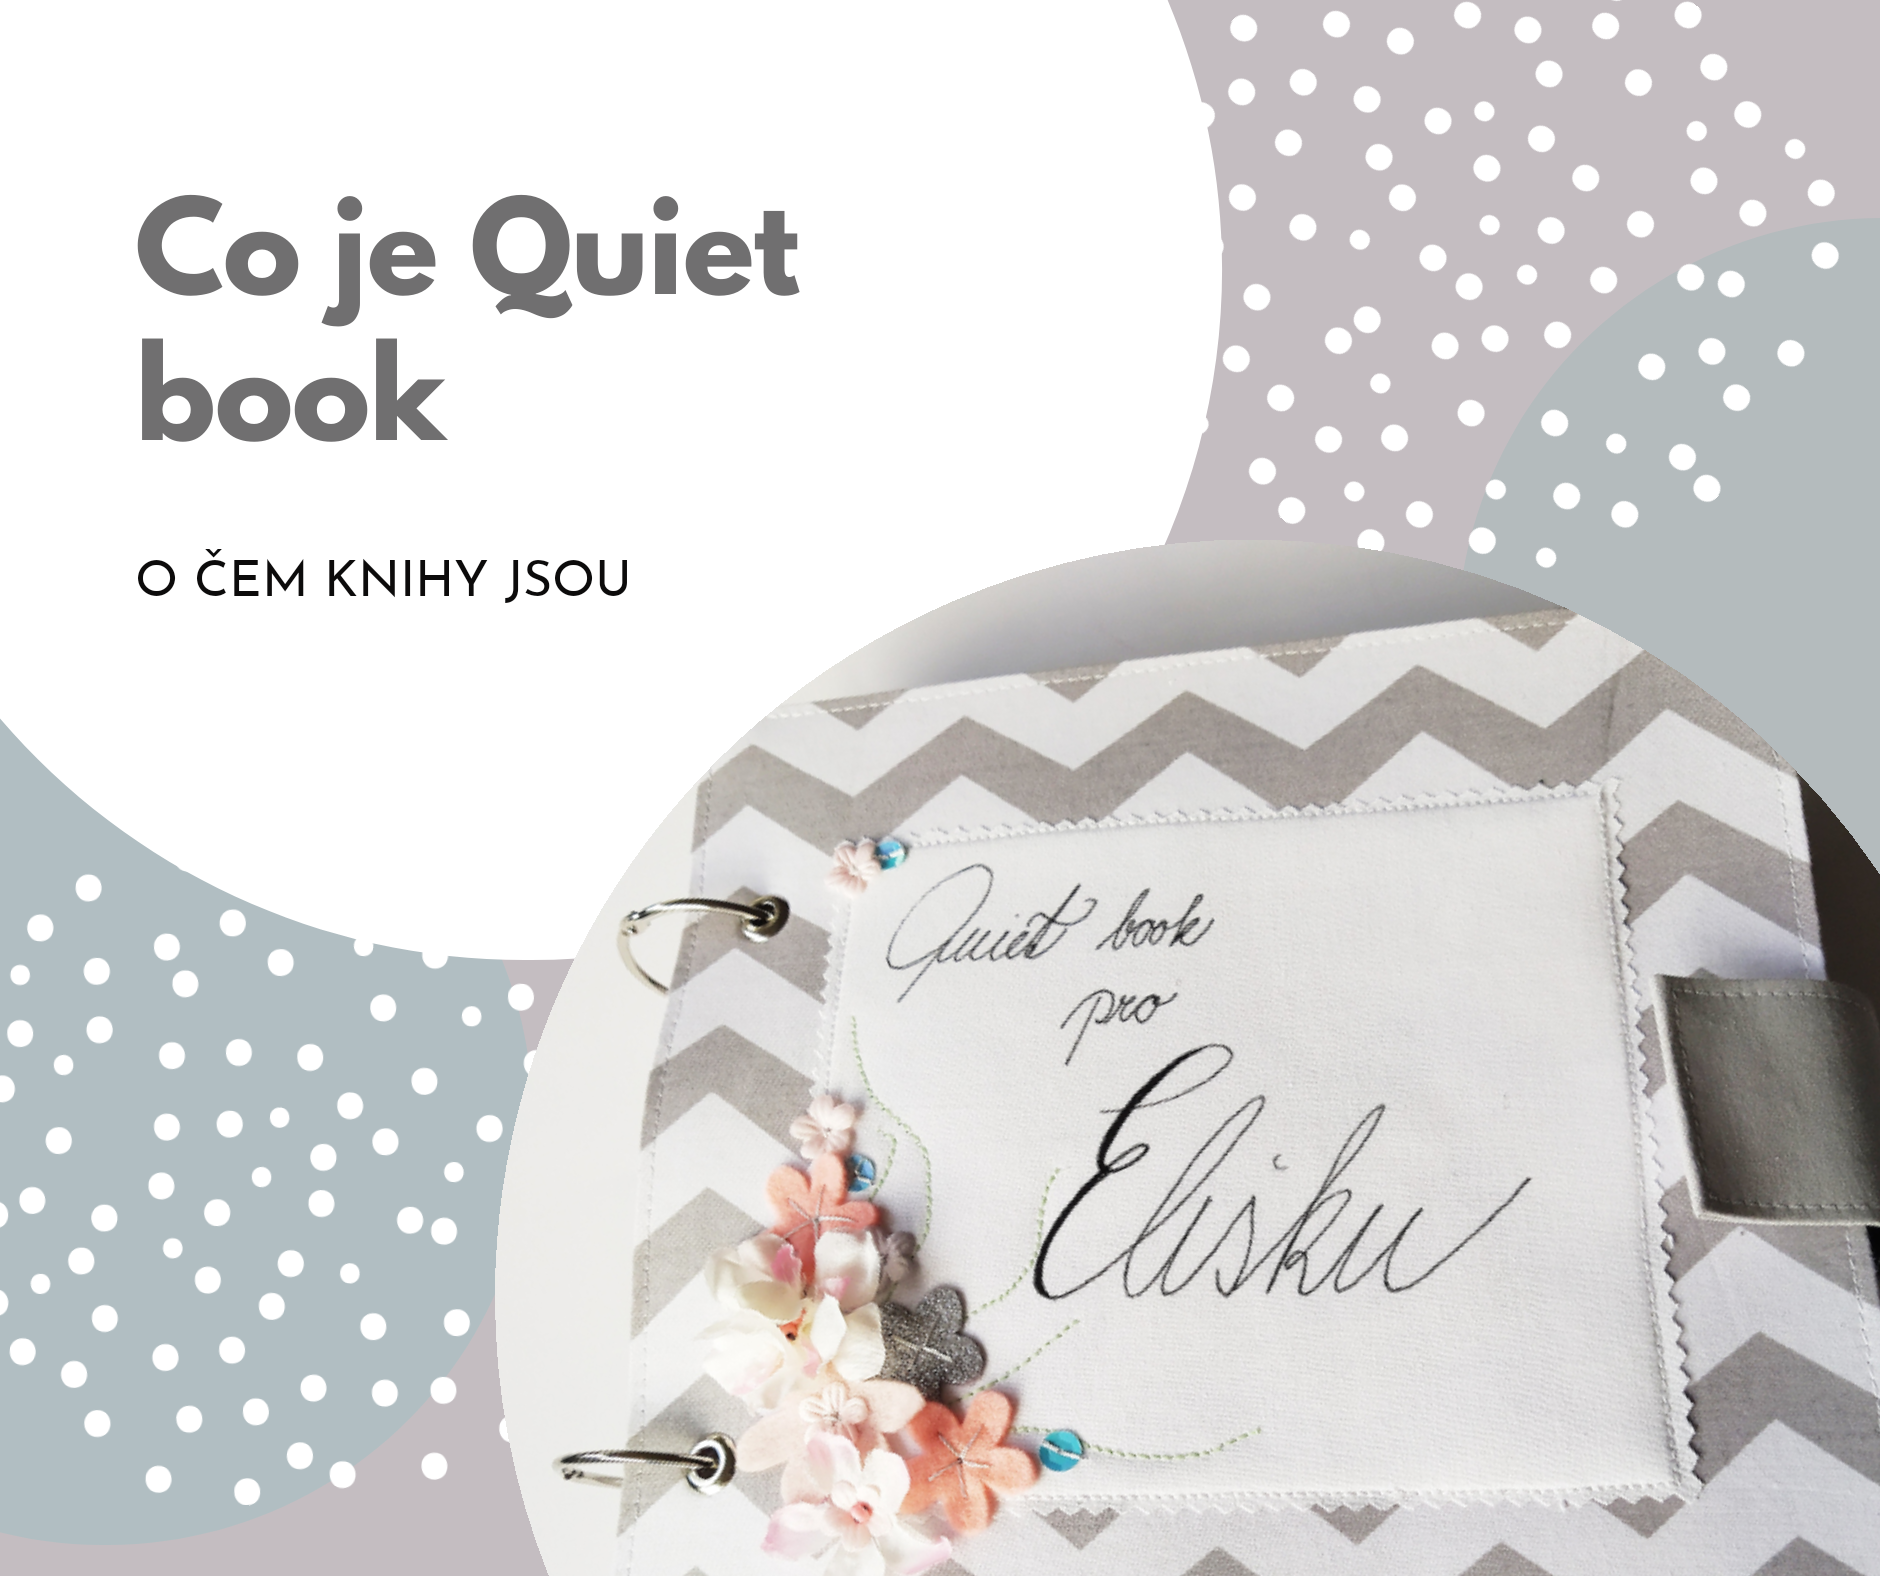 Co je Quiet book - tichá kniha